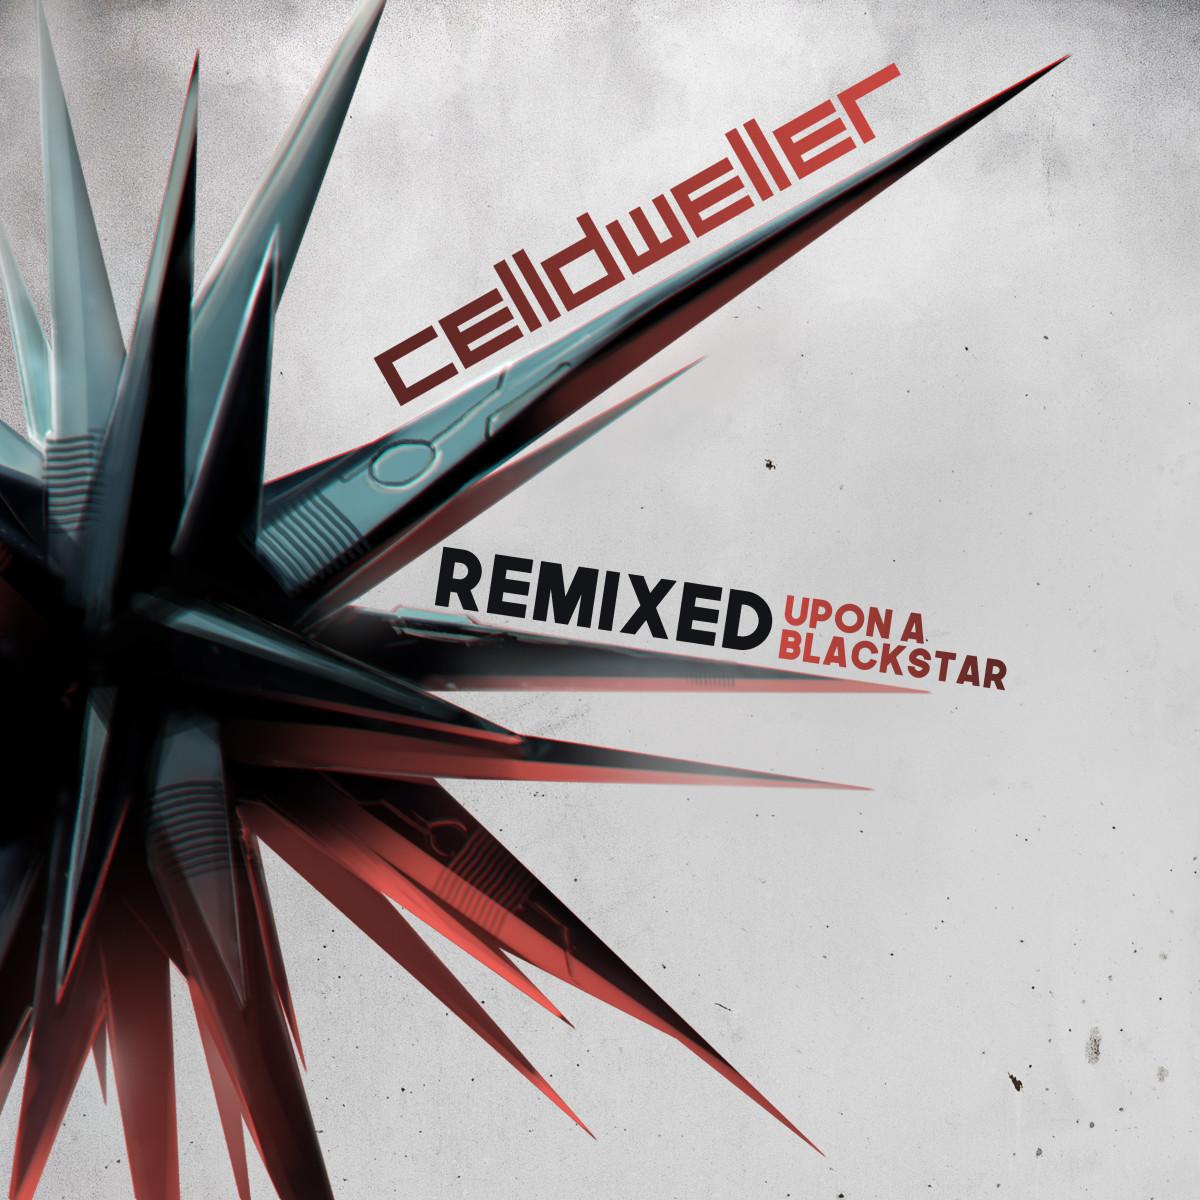 Celldweller - Remixed Upon A Black Star Album Cover (A5 Remix Premiere)